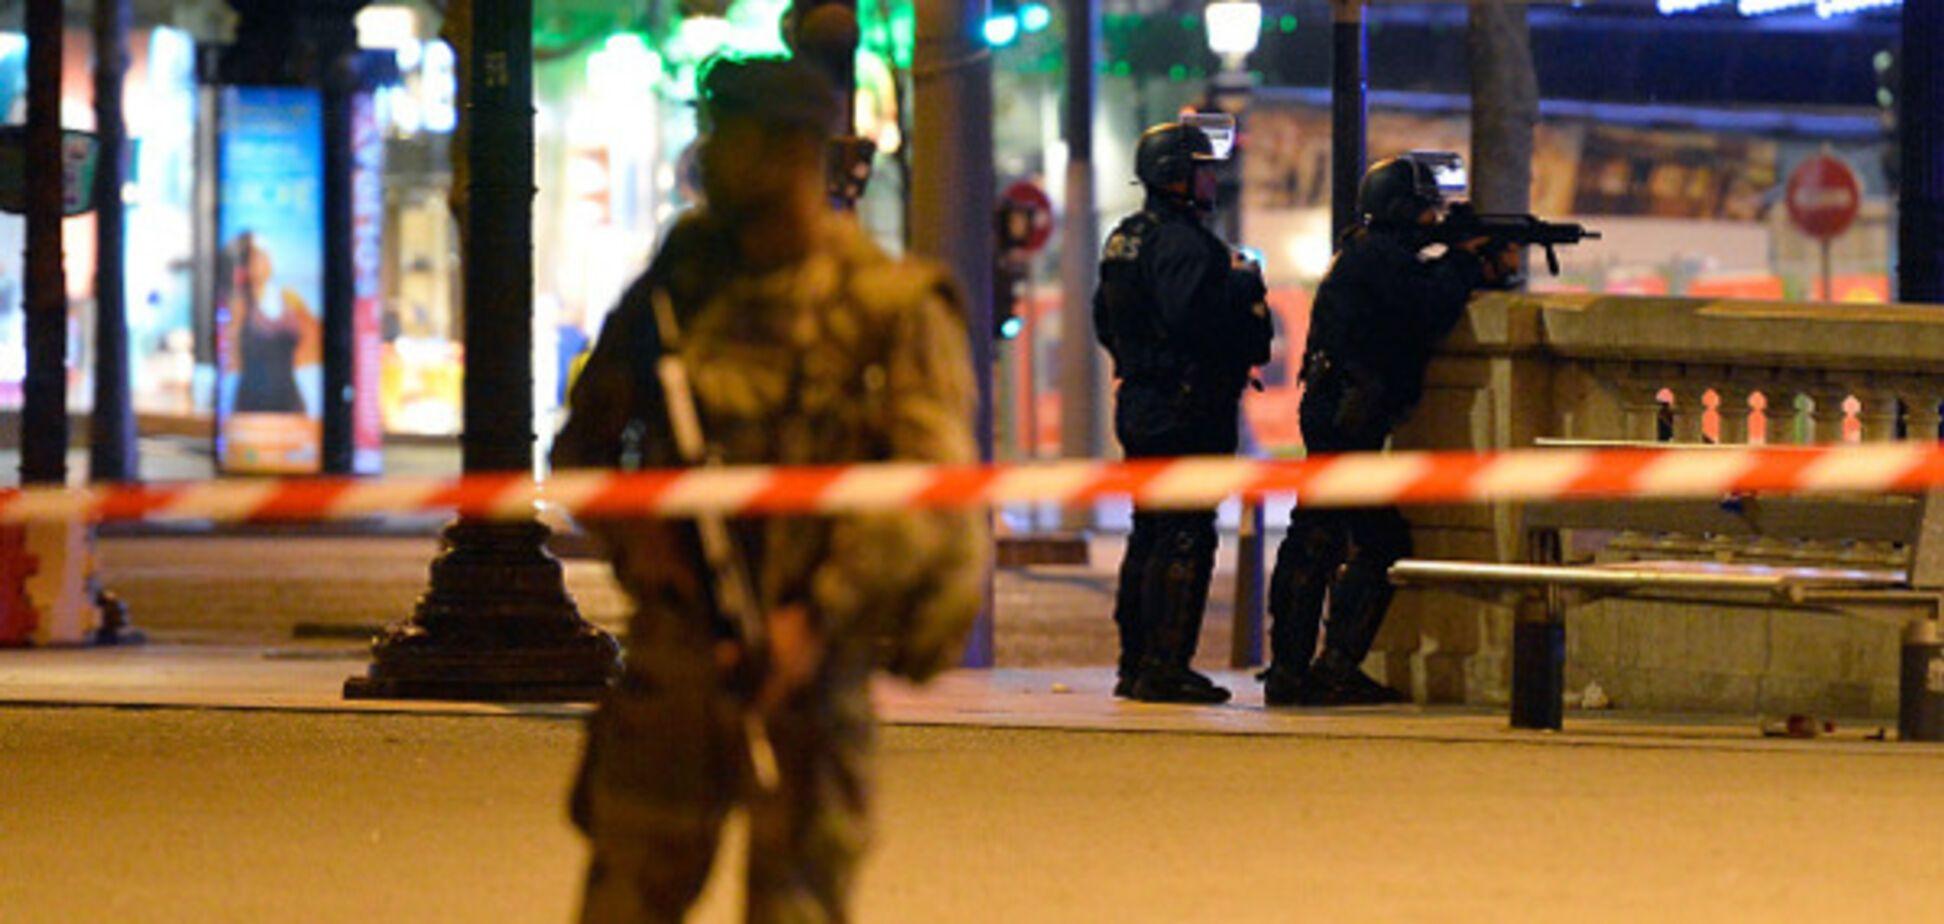 В центре Парижа произошла стрельба